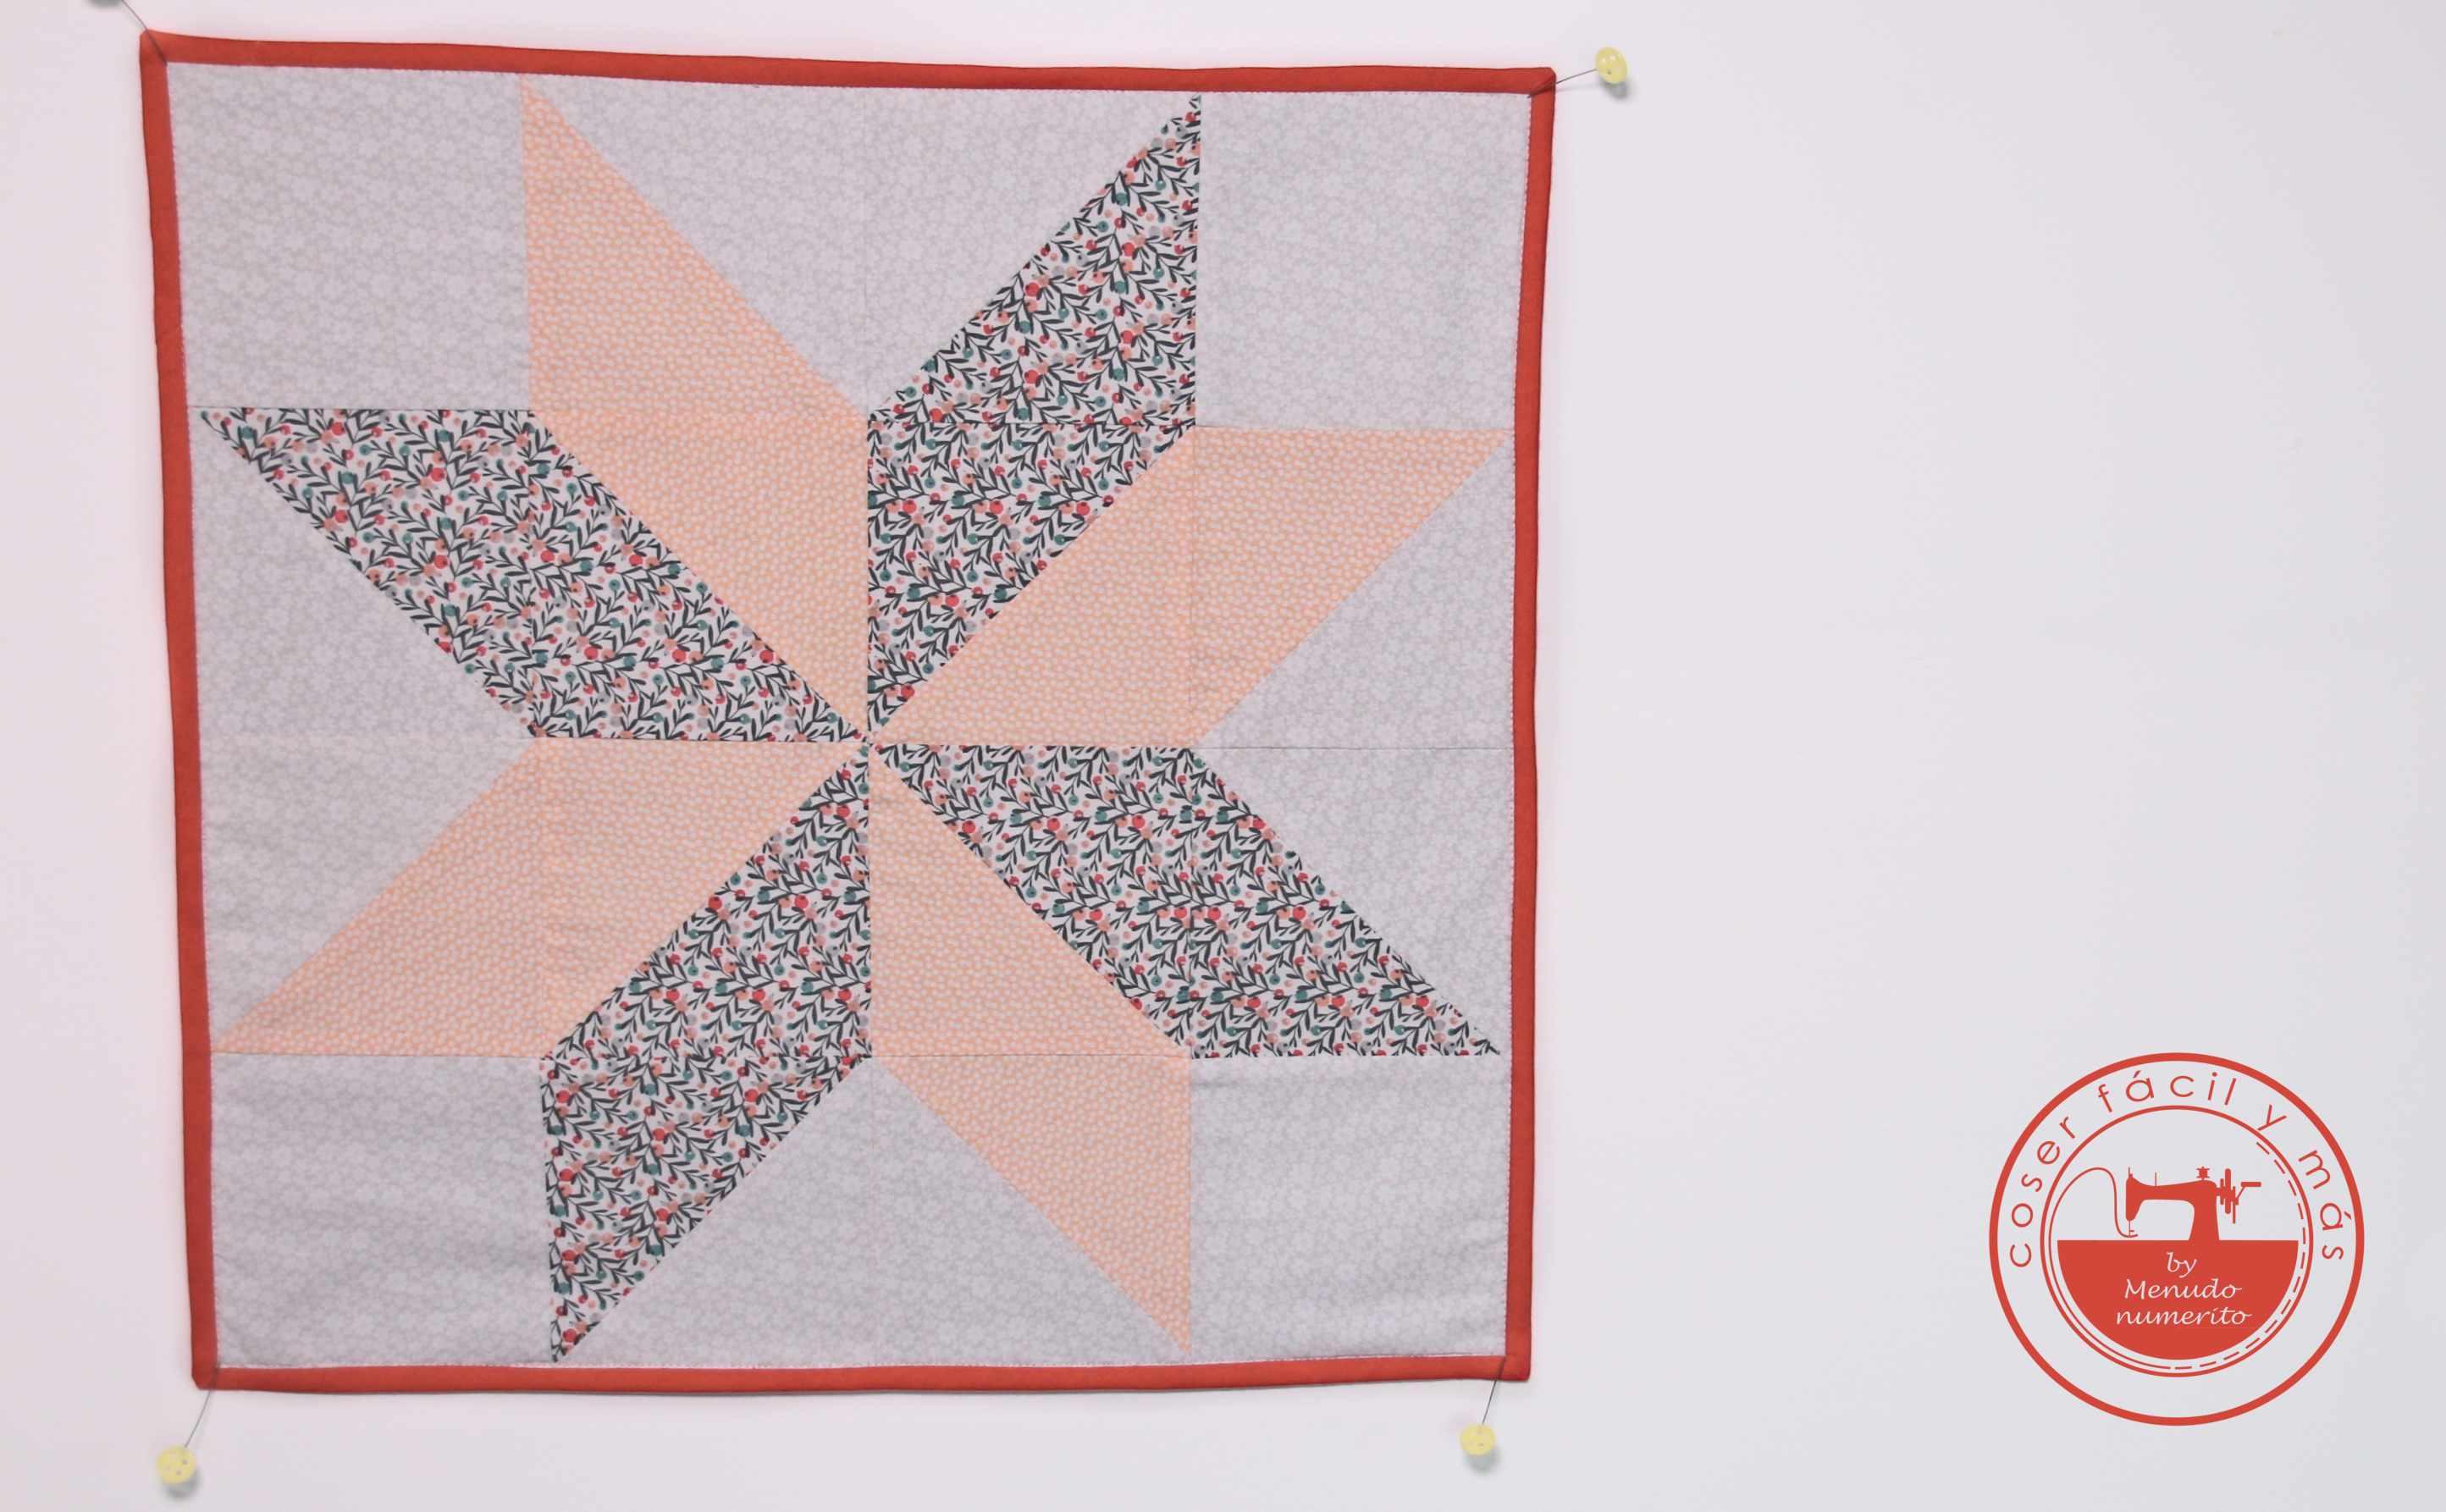 estrella lemoyne patchwork menudo numerito coserfacil